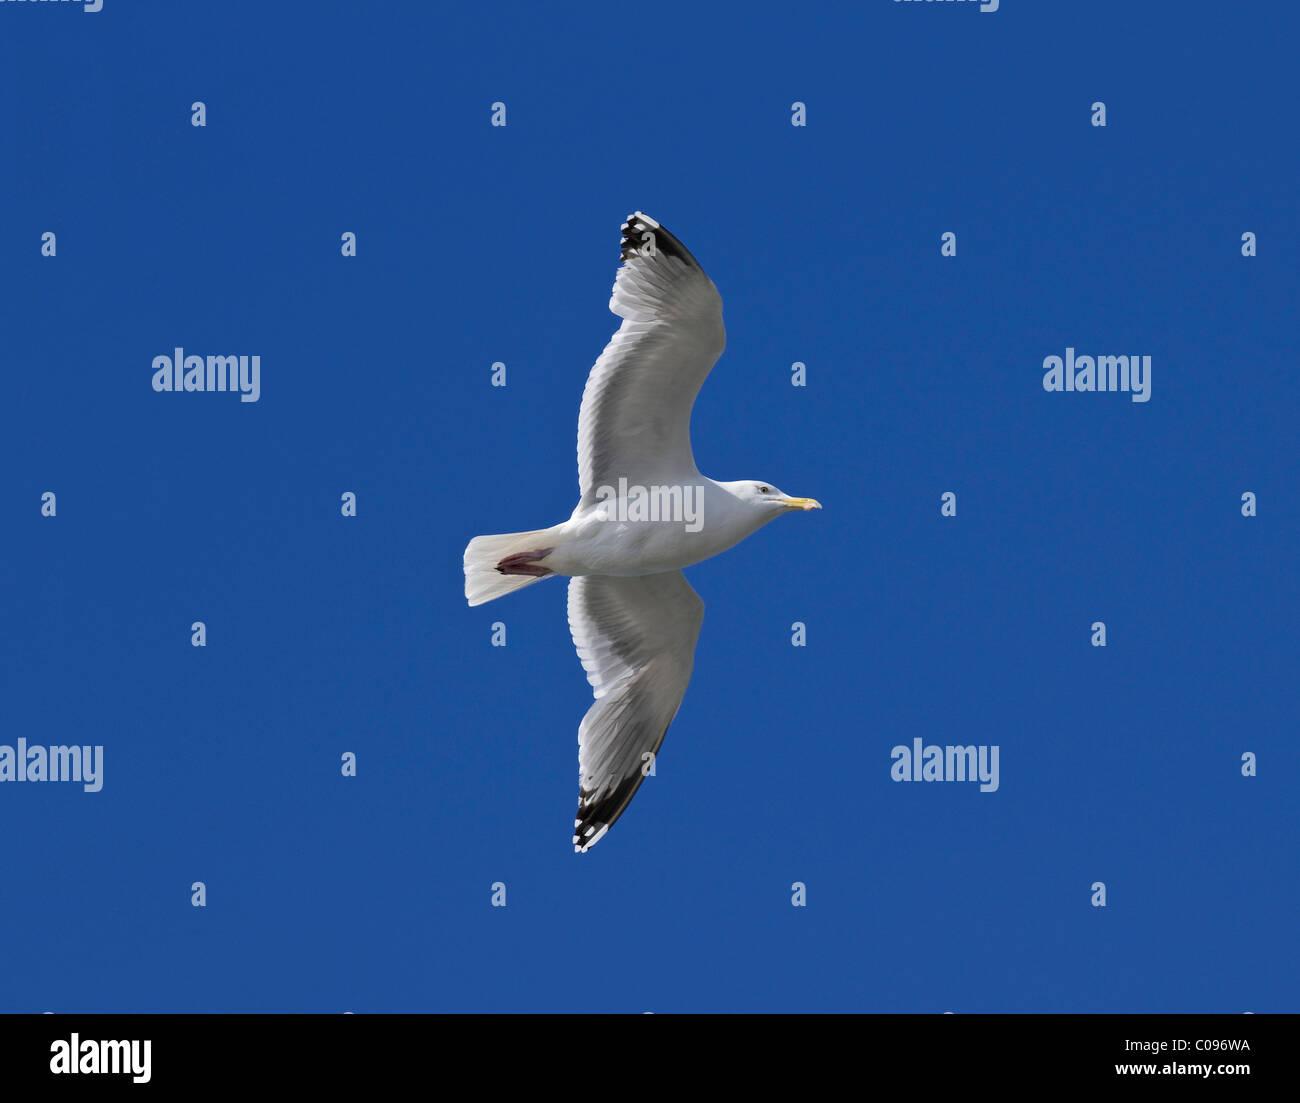 Herring gull (Larus argentatus in) gliding - Stock Image